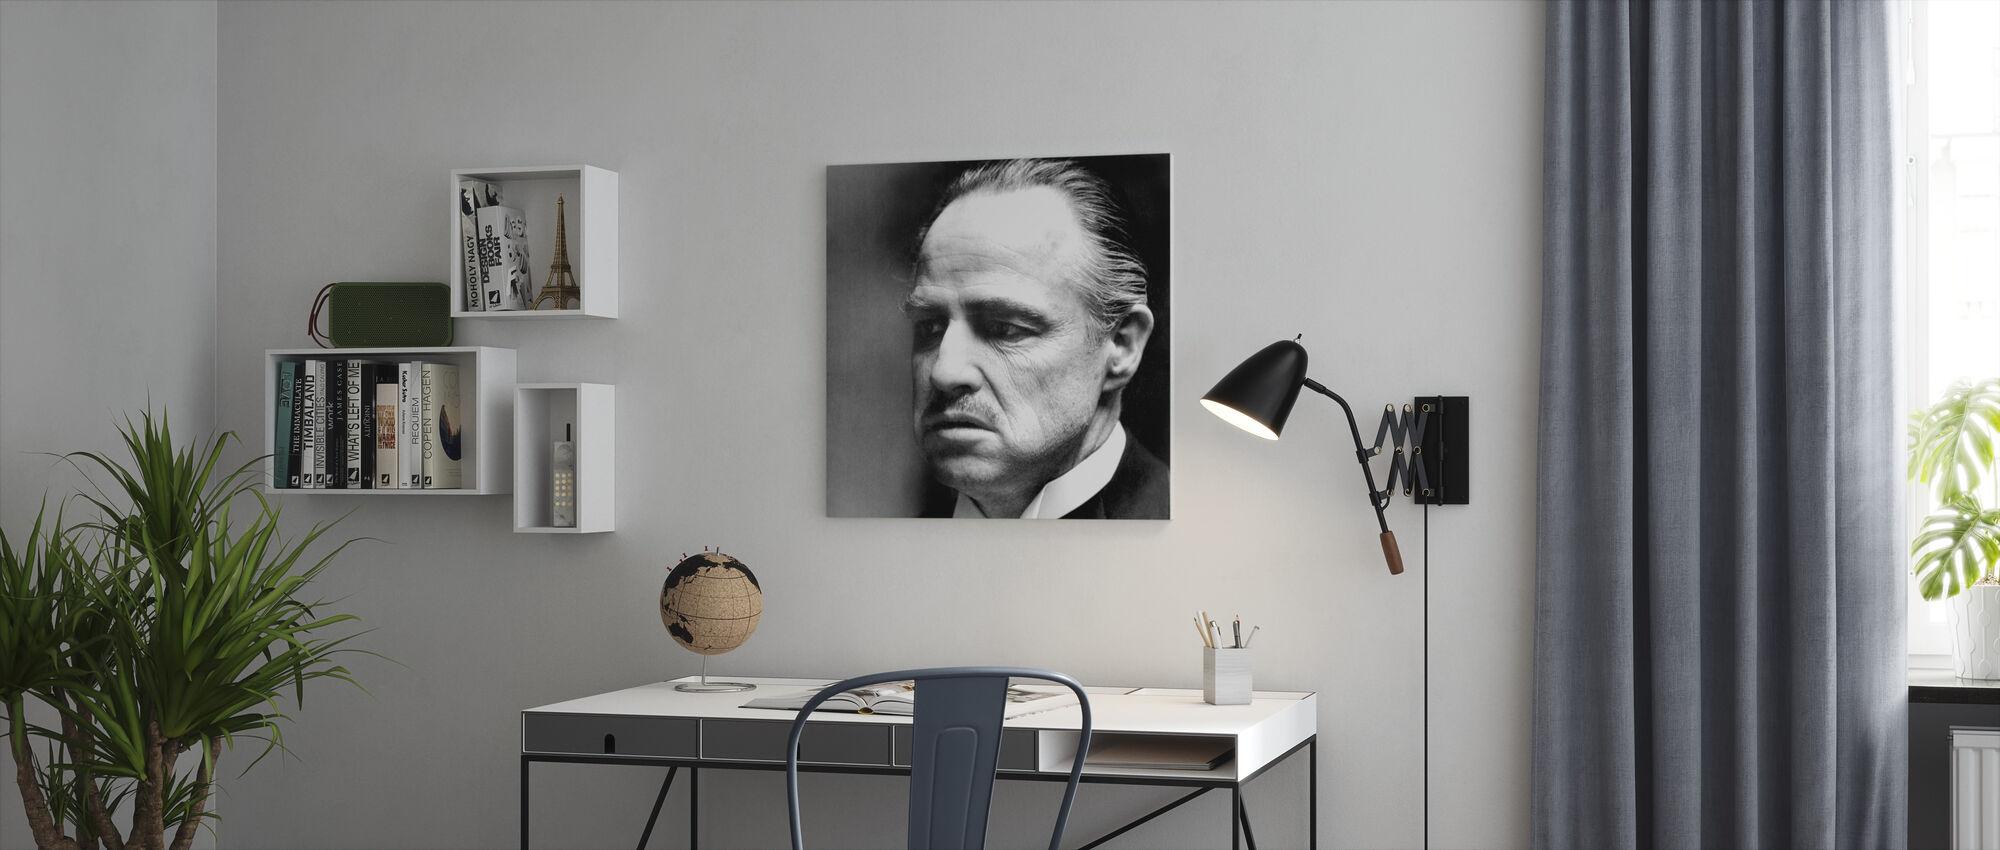 The Godfather - Don Vito Corleone - Canvas print - Office